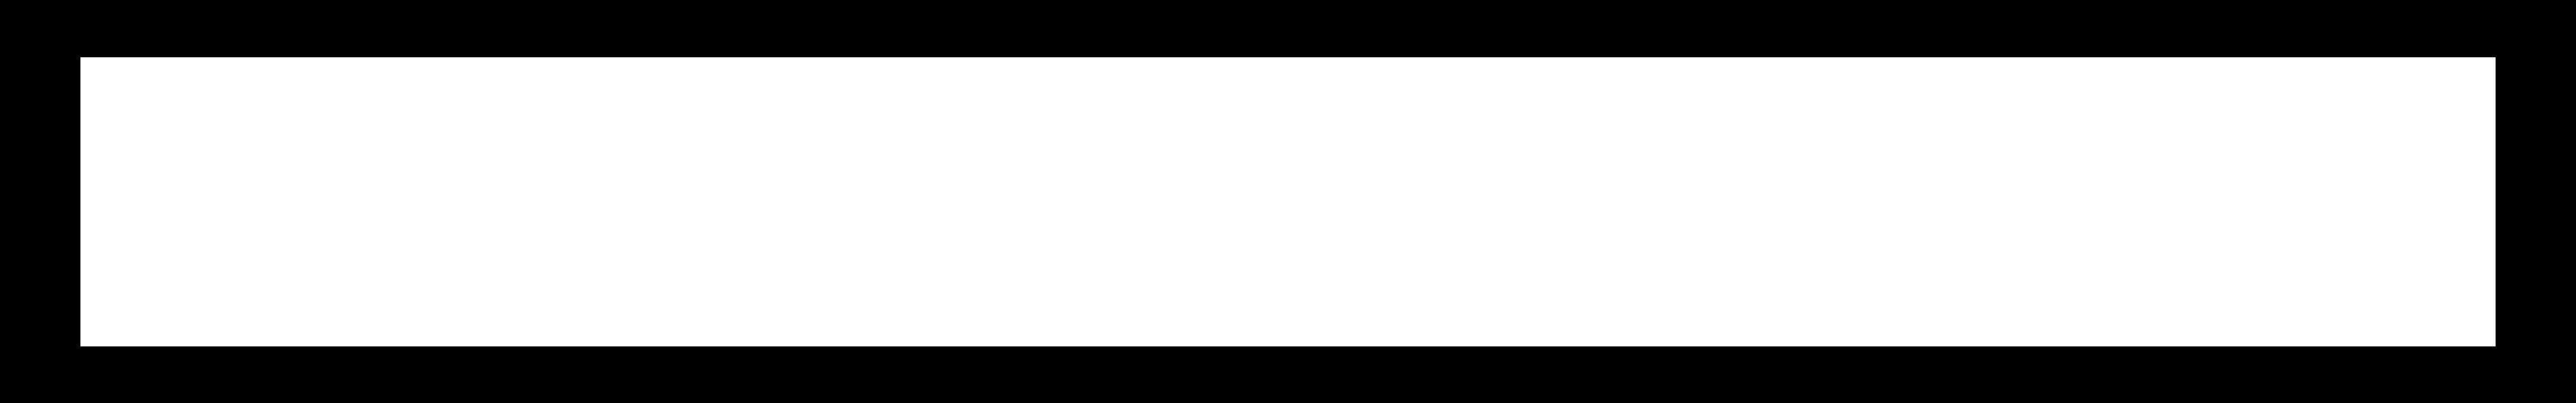 Logo Absolute Navetta 52